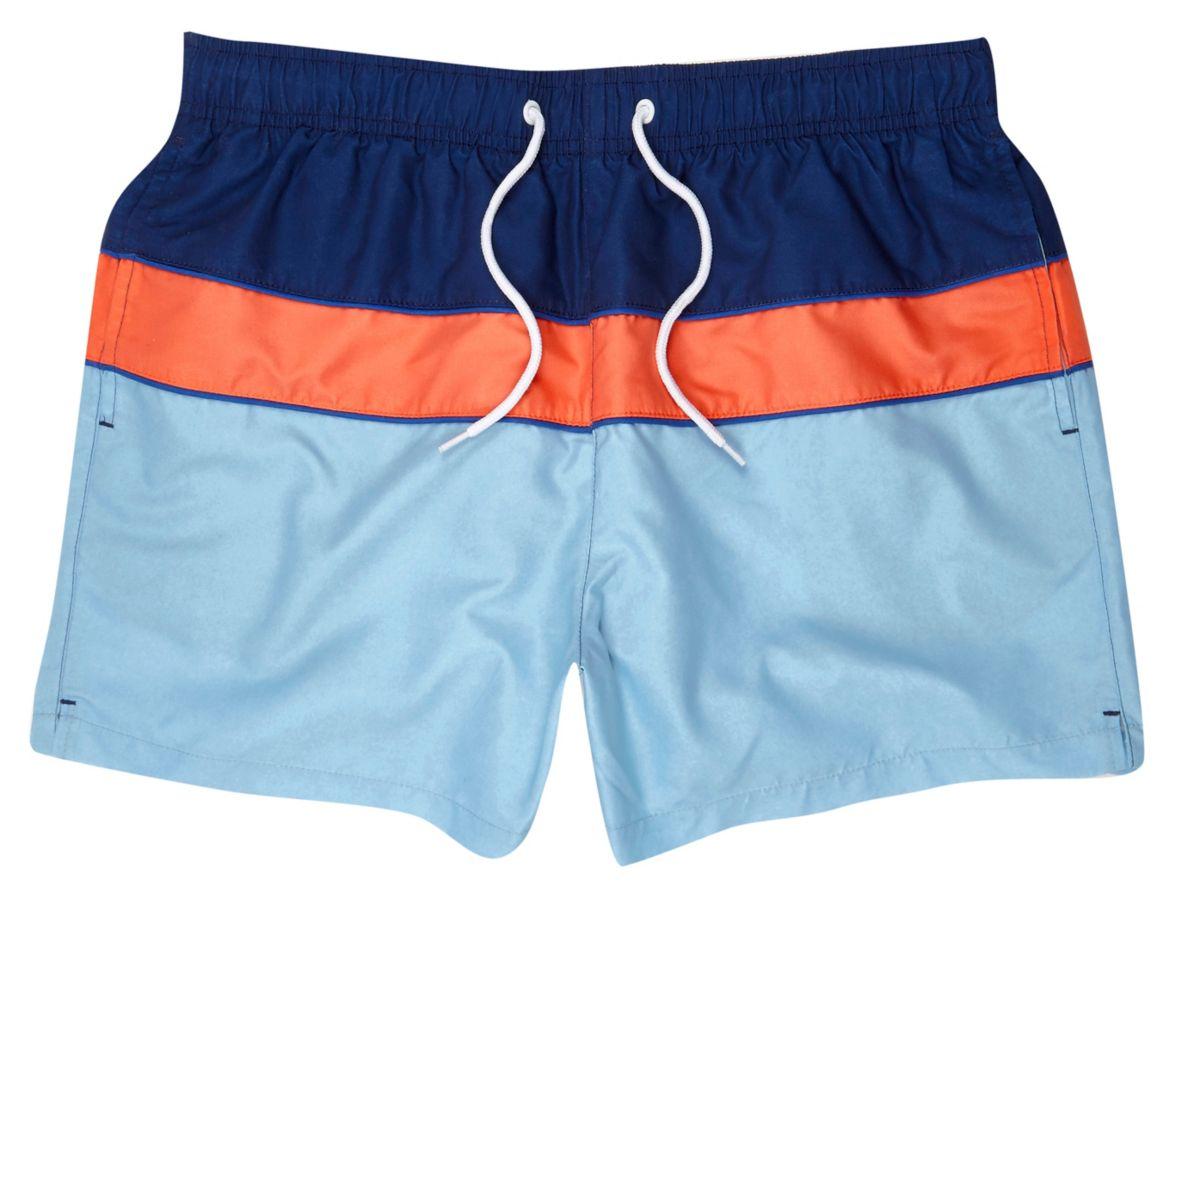 Orange block color swim trunks